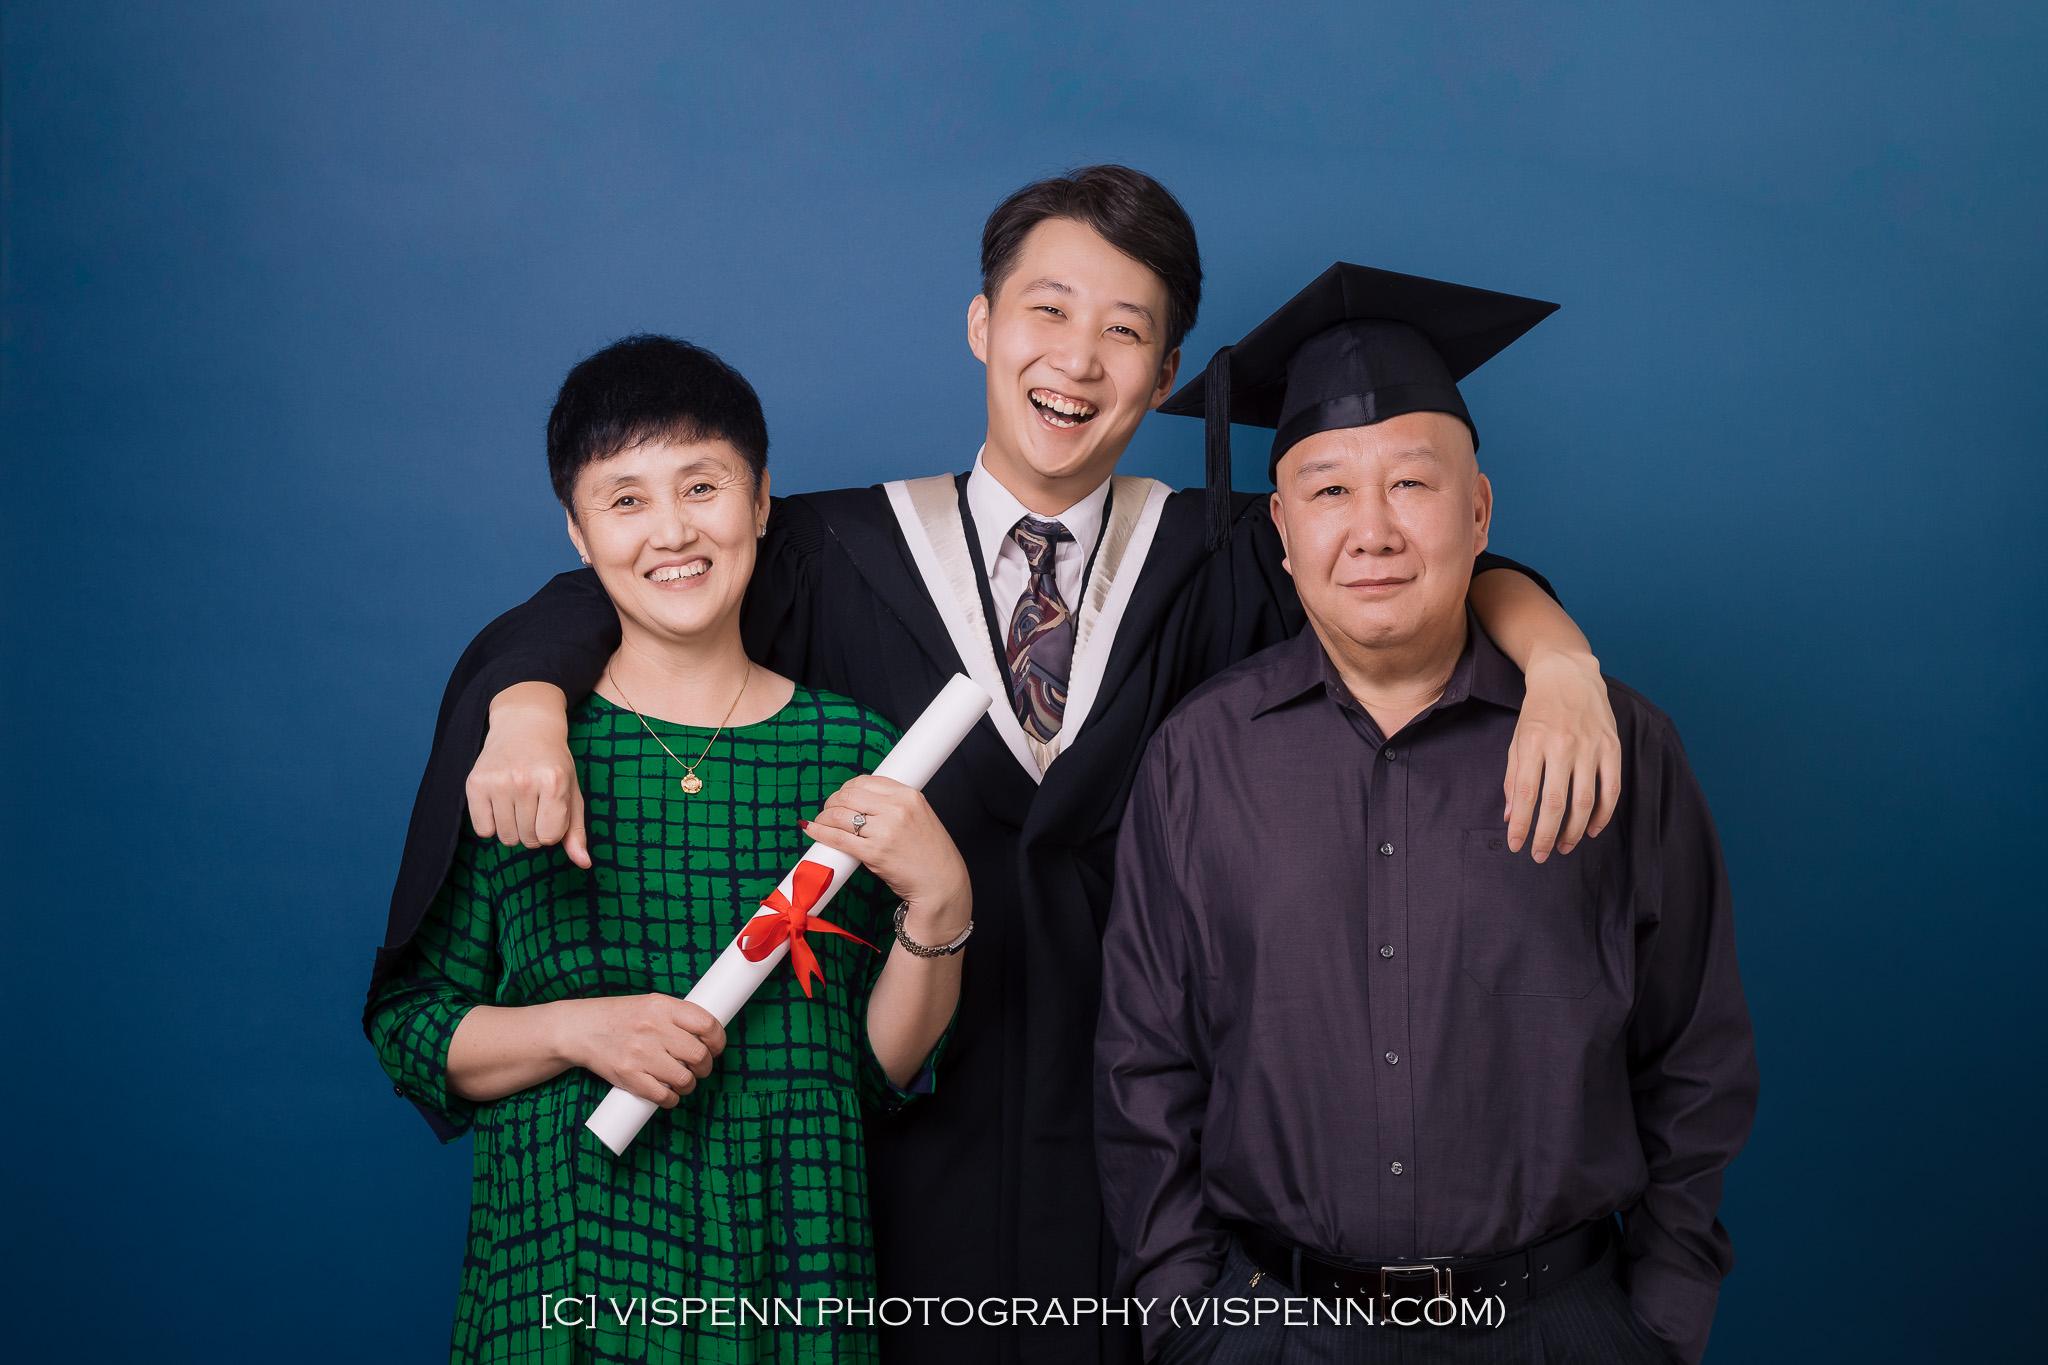 Headshot Melbourne Graduation Photoshoot VISPENN 墨尔本 毕业照 毕业摄影 5D5 3790 Edit